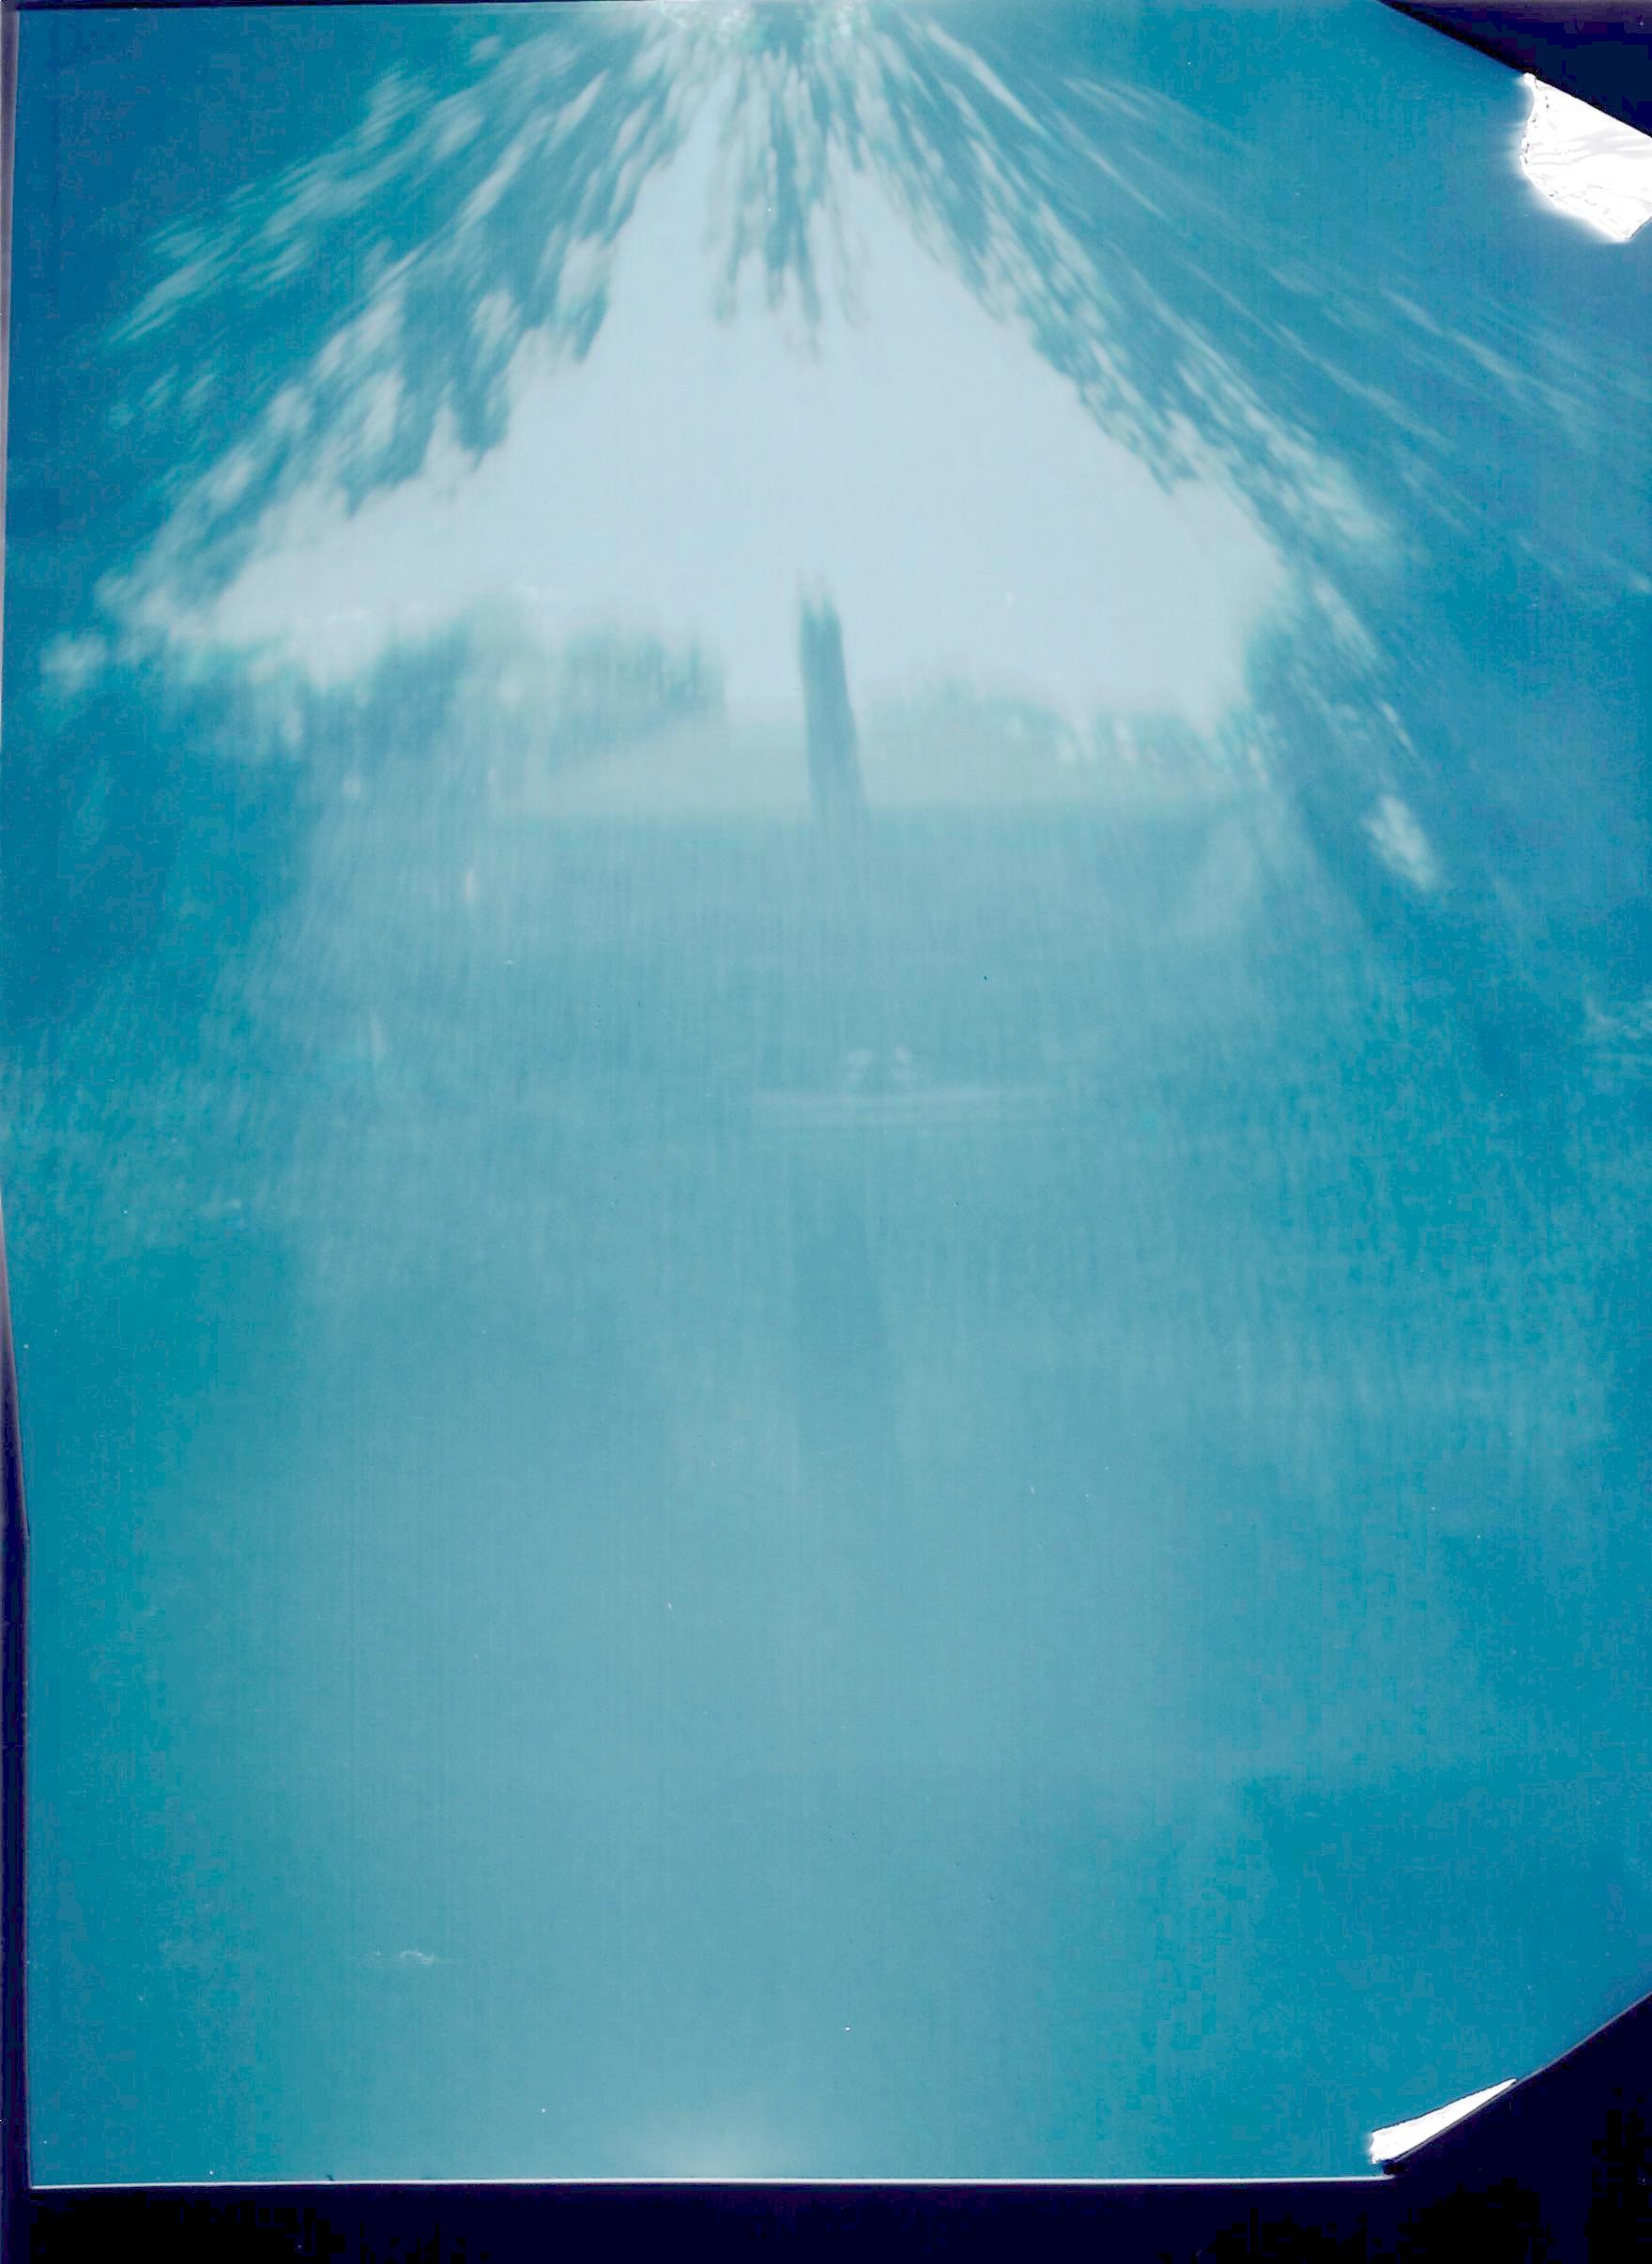 solargraph1-inverted-color.jpeg